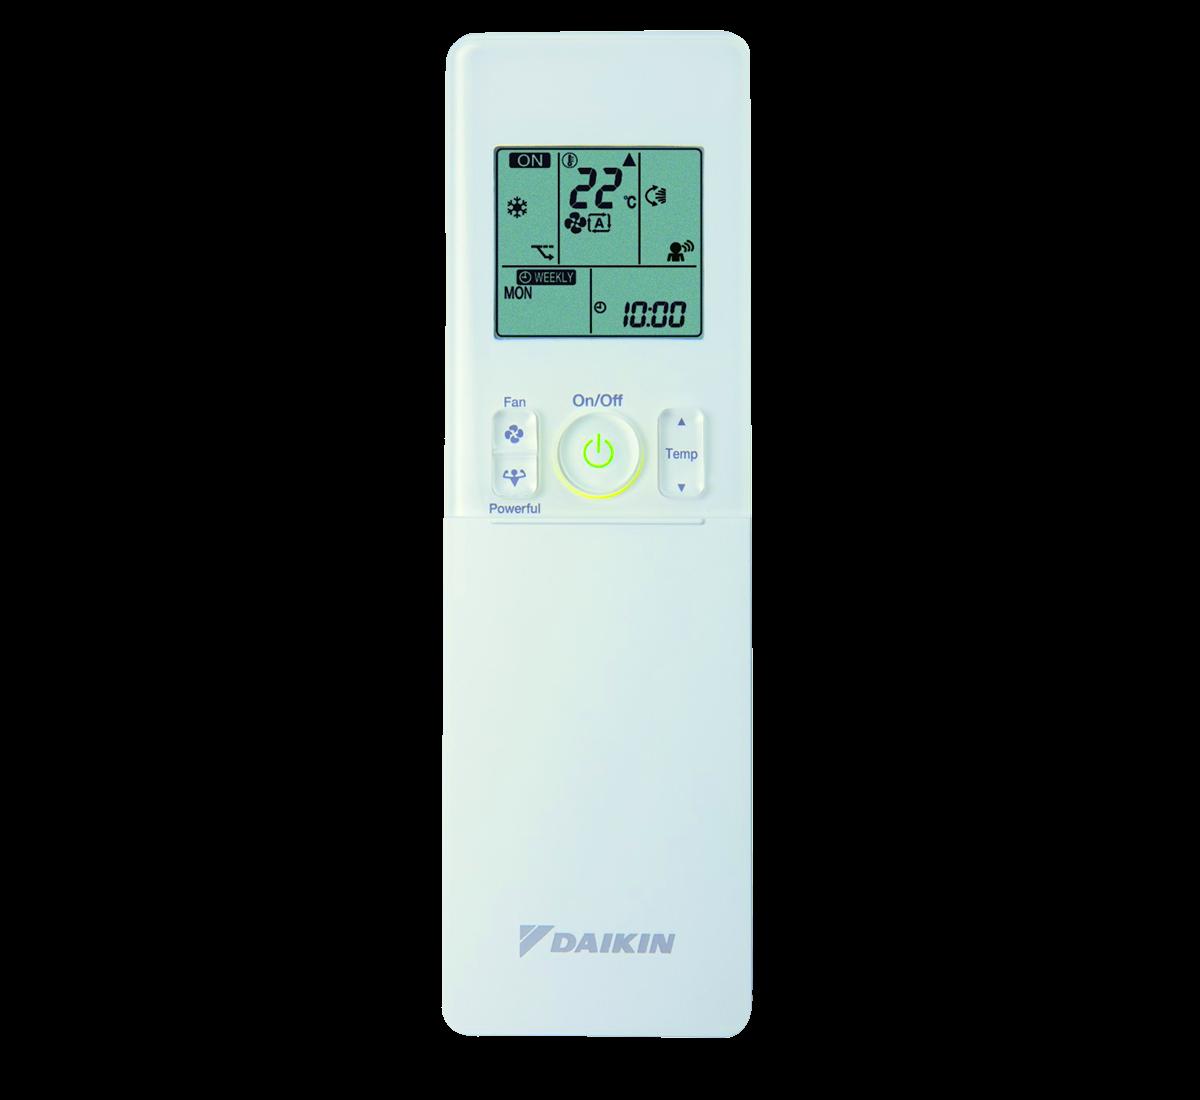 aire acondicionado conjunto split daikin inverter mando a diastanacia arc466a33 modelo comfora txm25n instalacion incluida caseragua